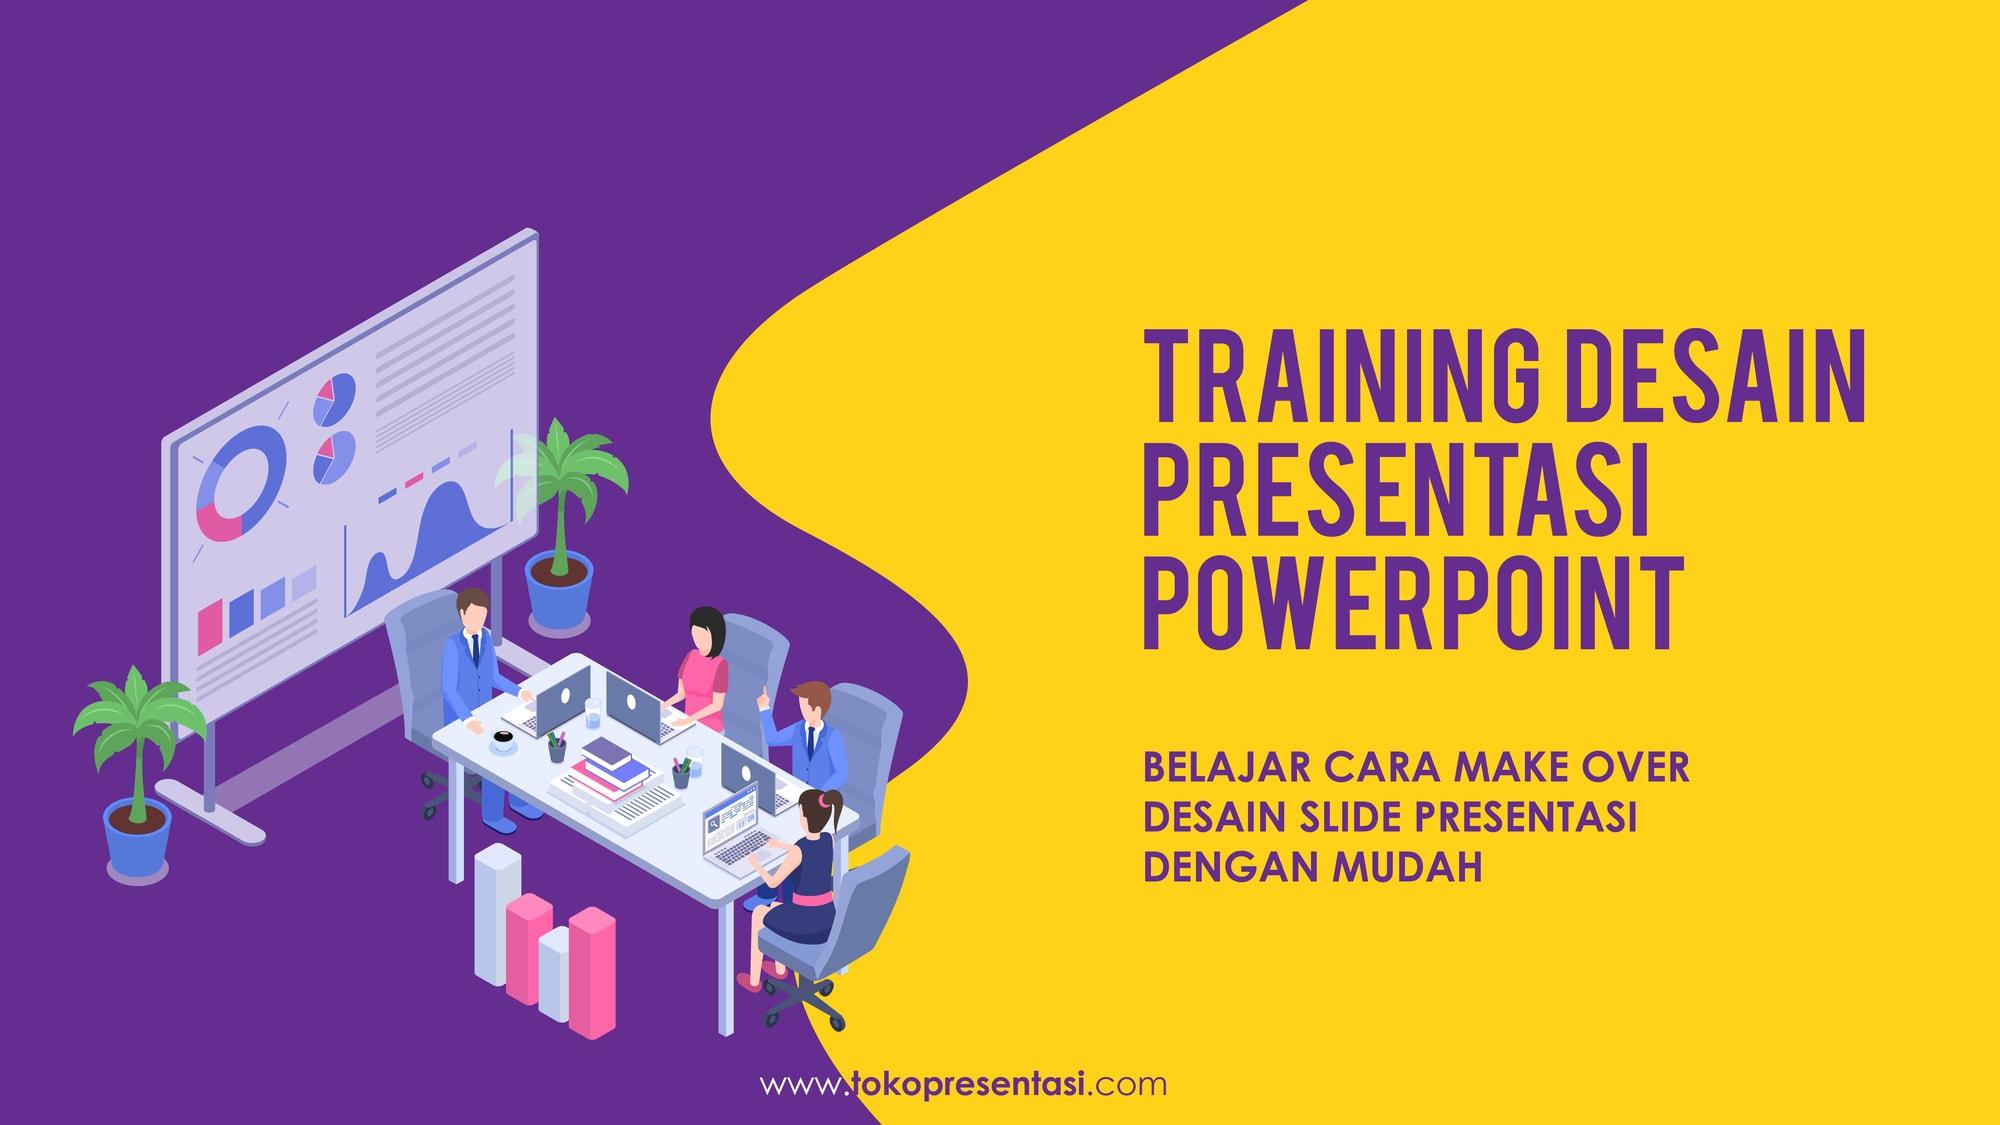 Training Desain PowerPoint PPT Dewan Ketahanan Nasional Tokopresentasi